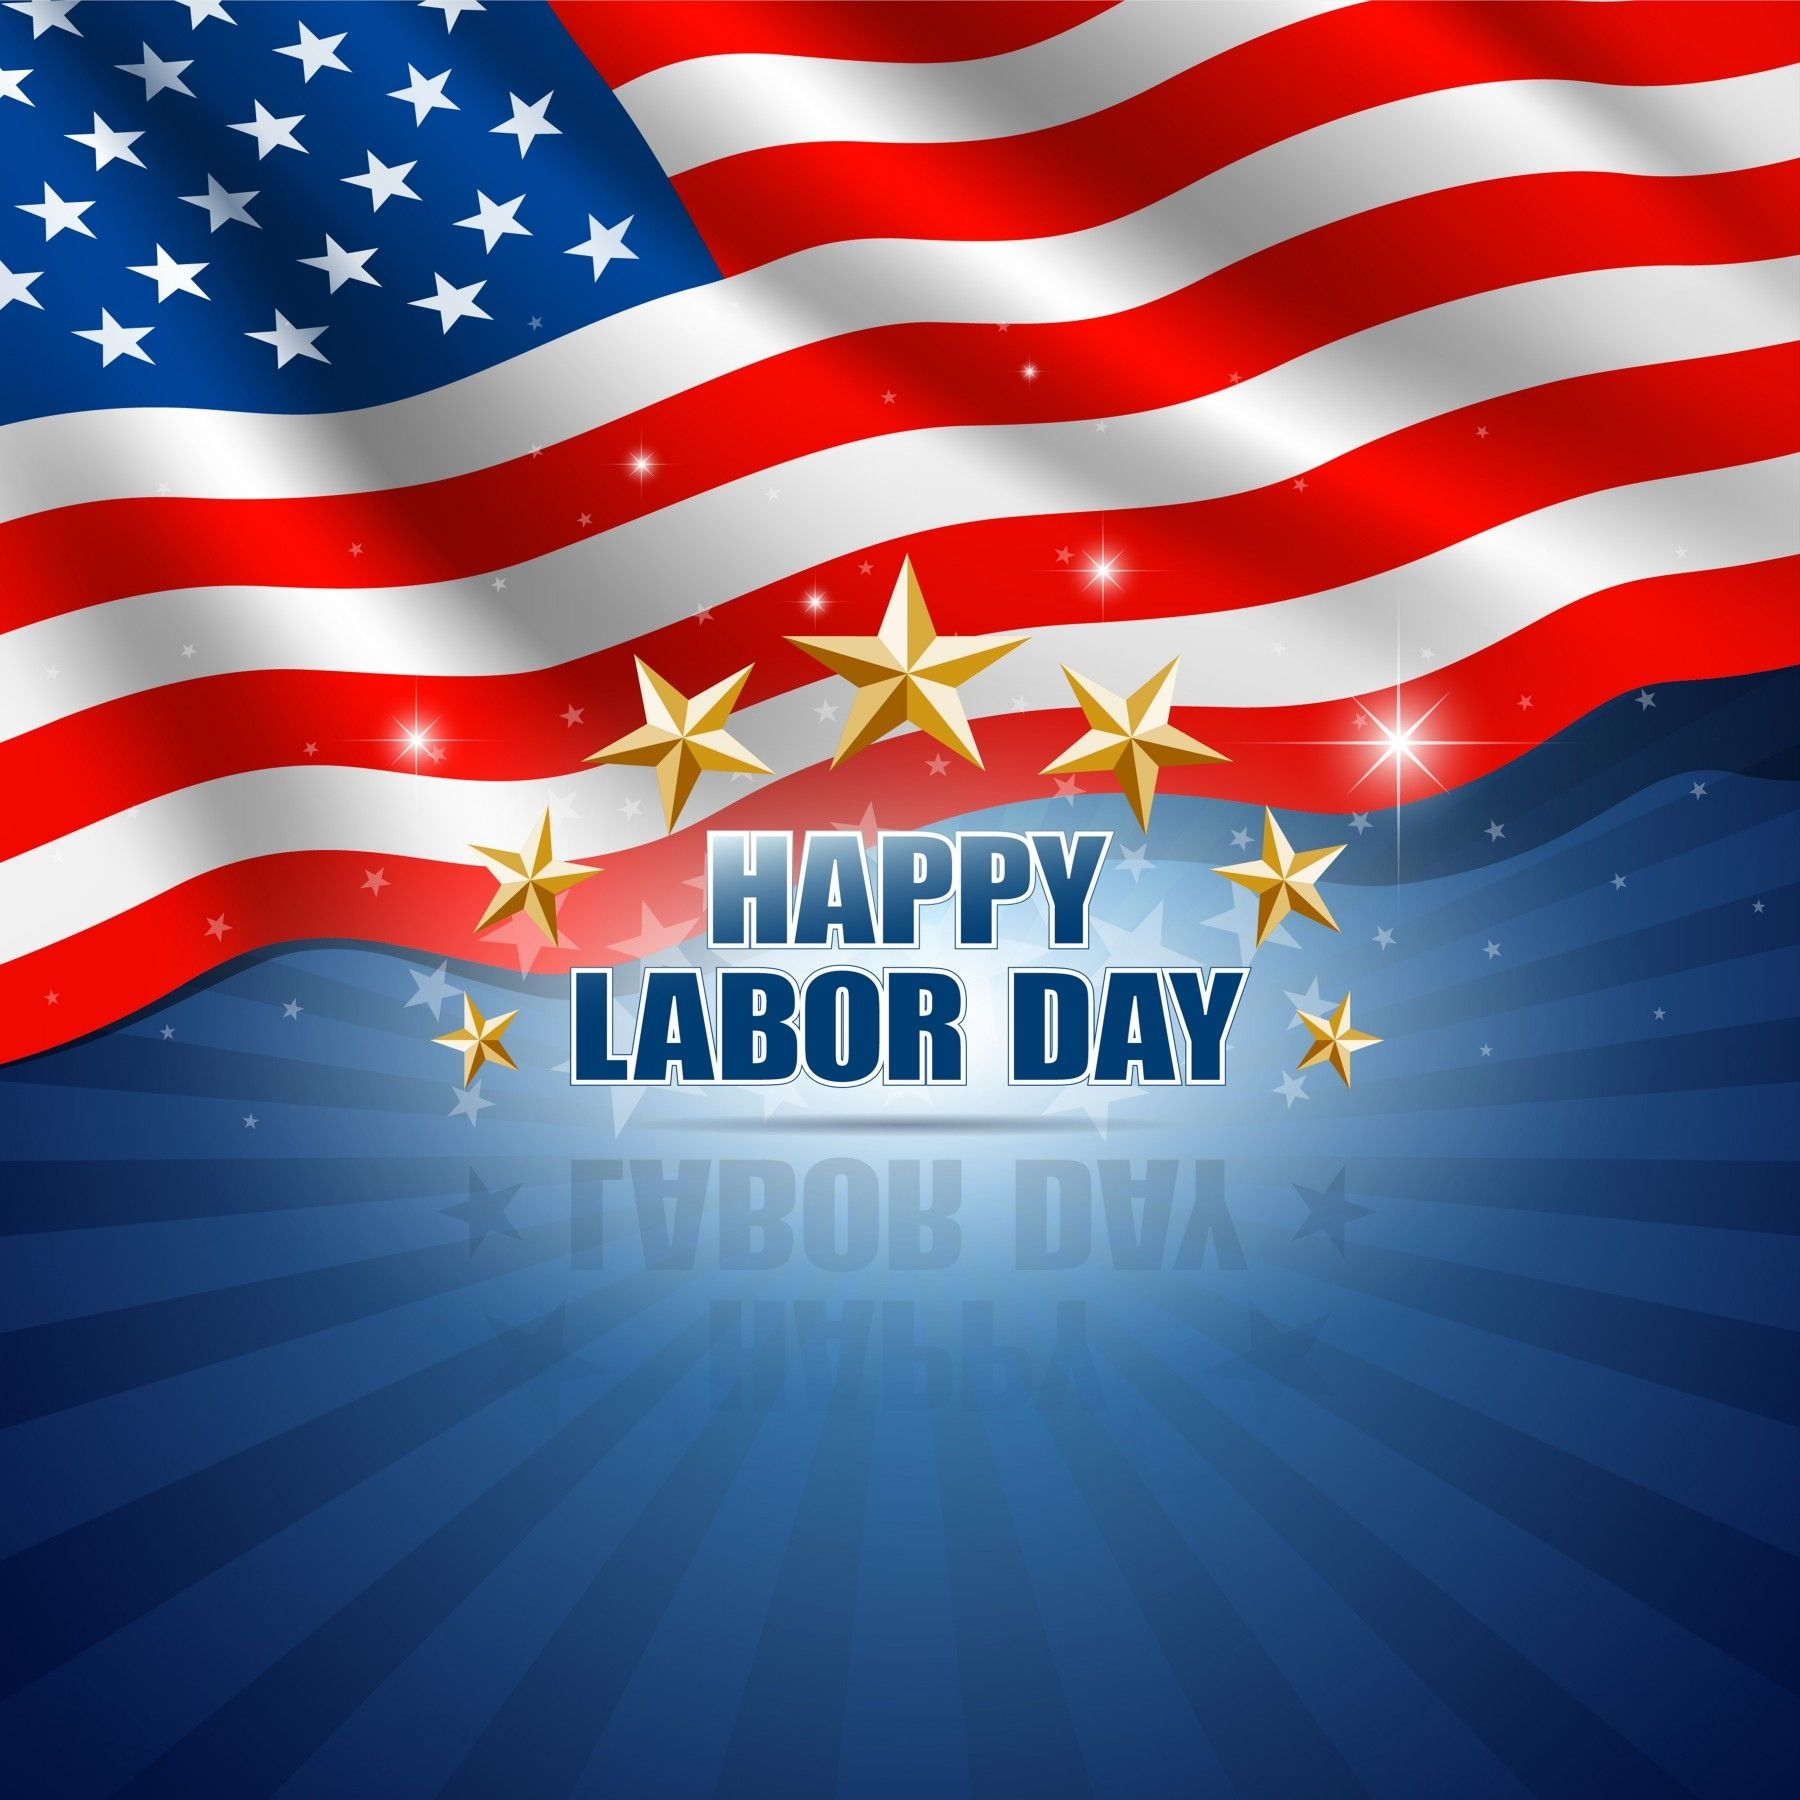 happy labor day usa flag holiday labor day happy labor day labor